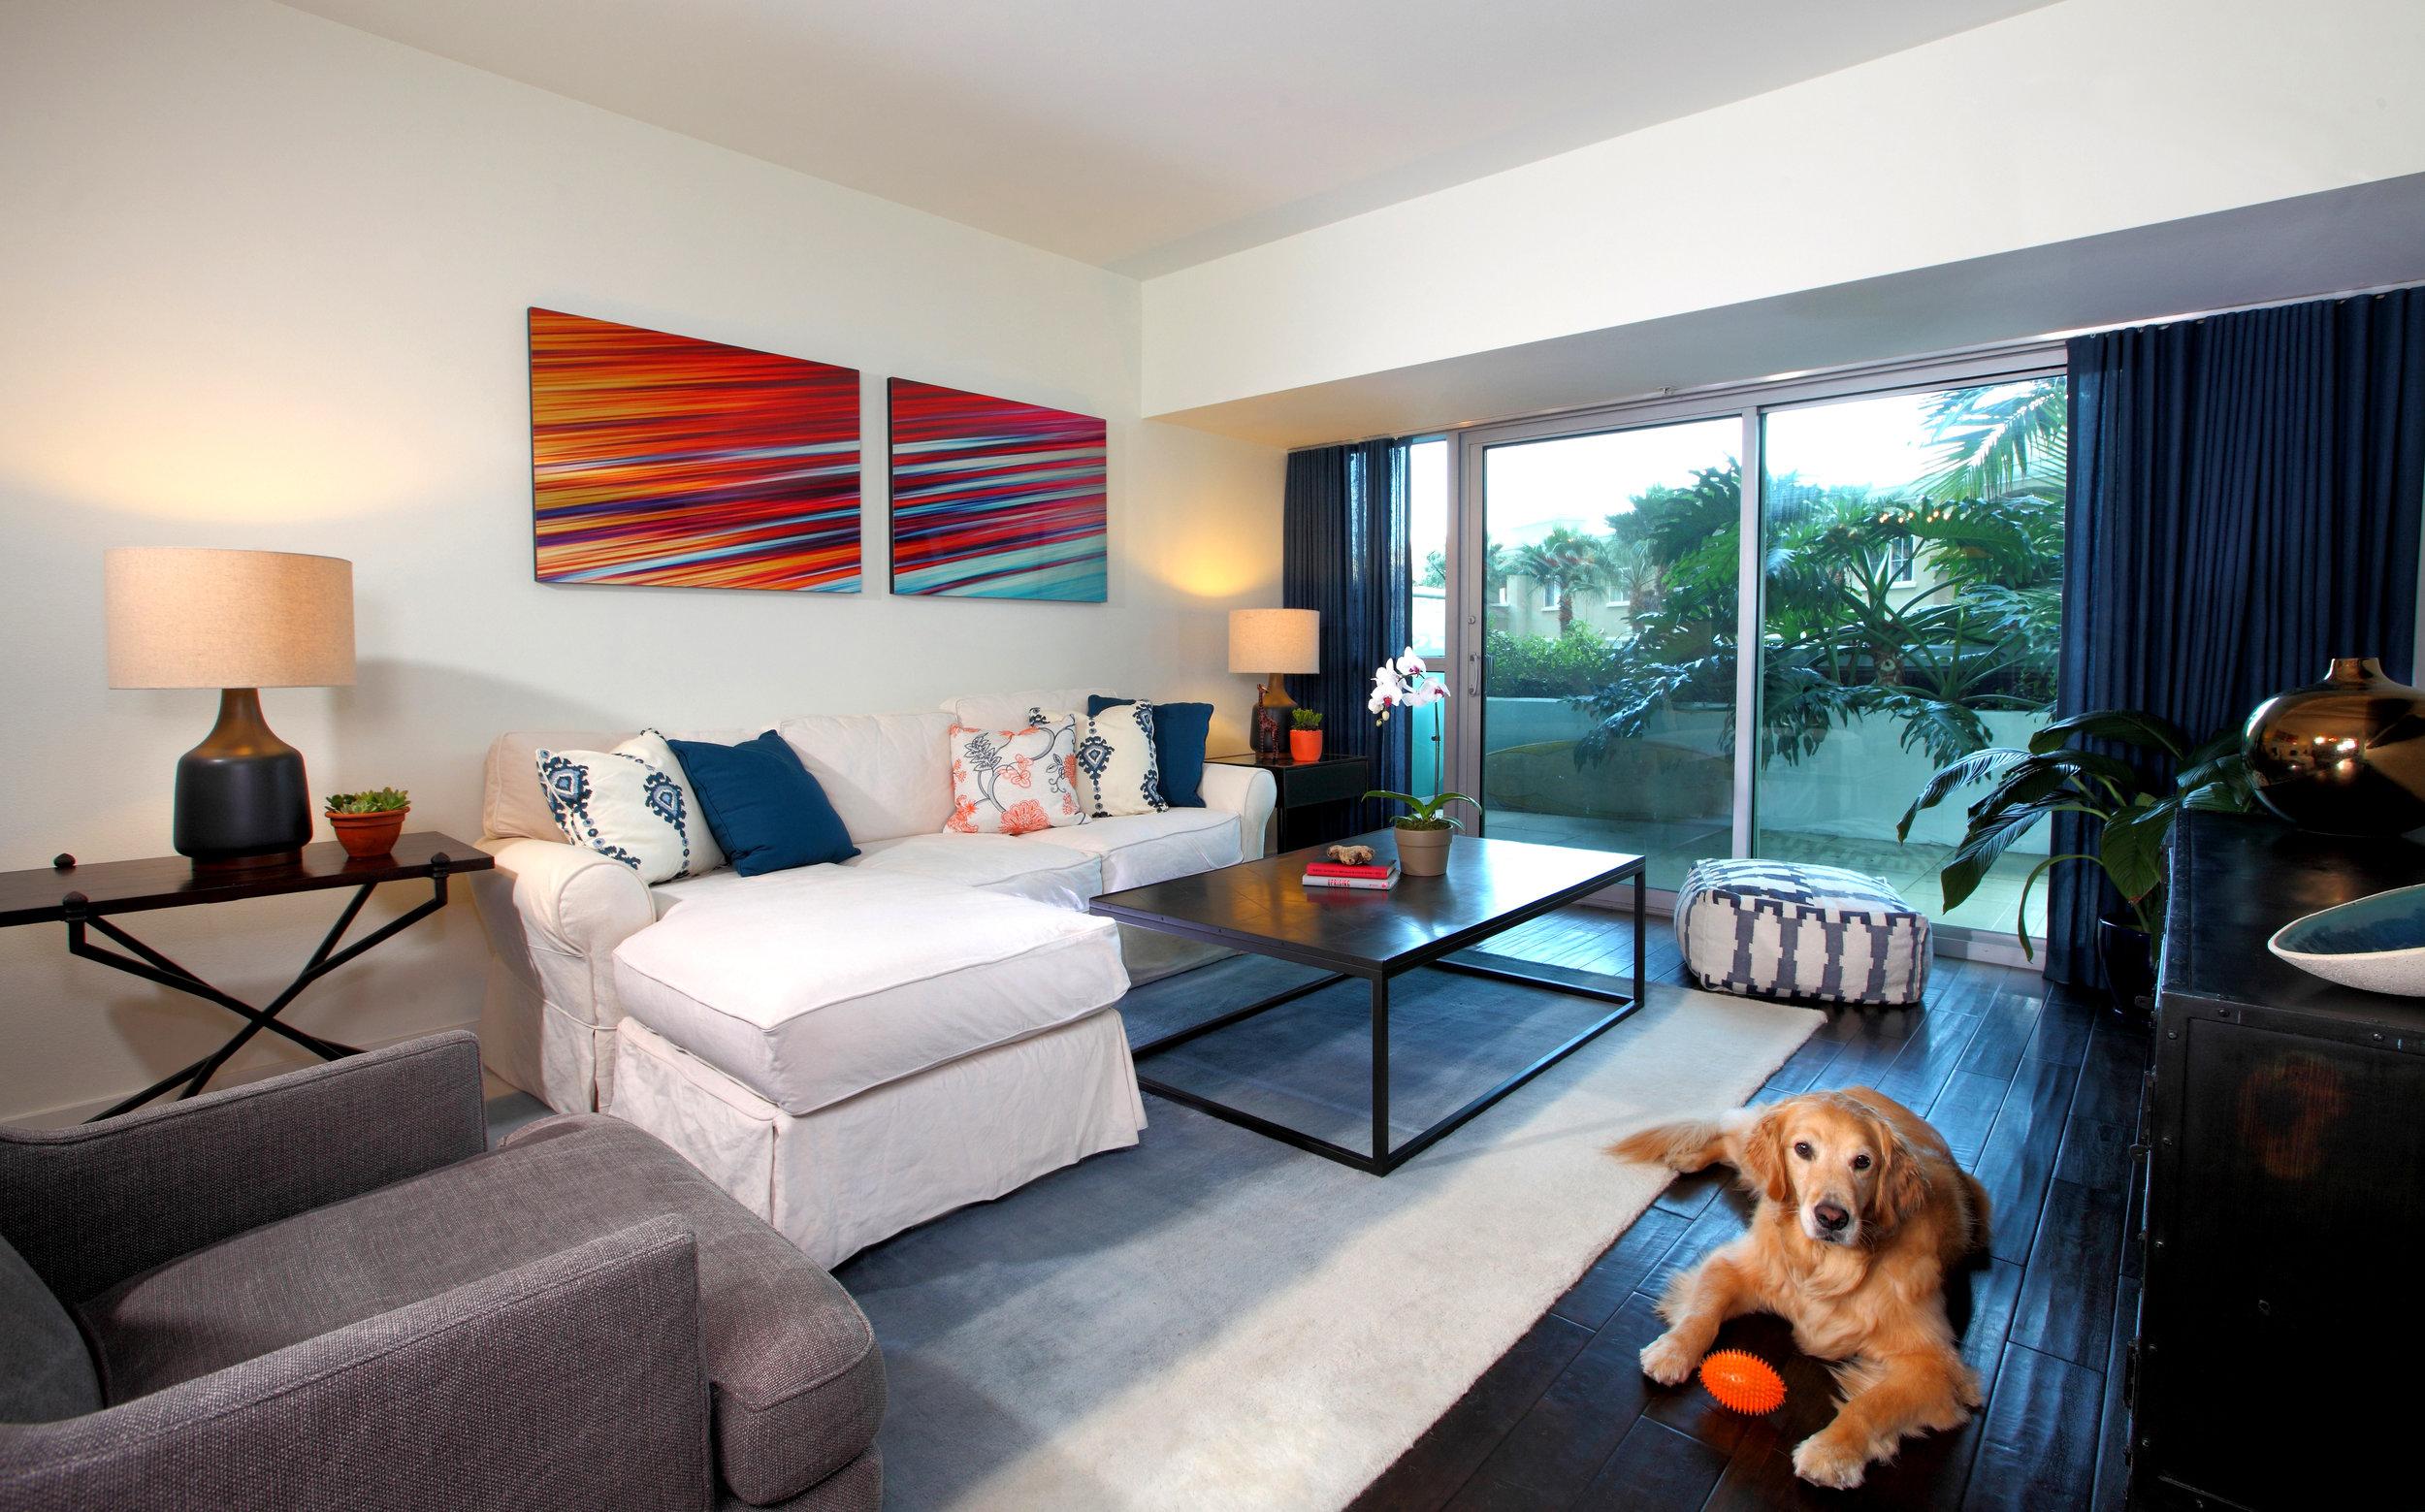 Sarah-barnard-design-modern-bachelorpad-livingroom.jpg